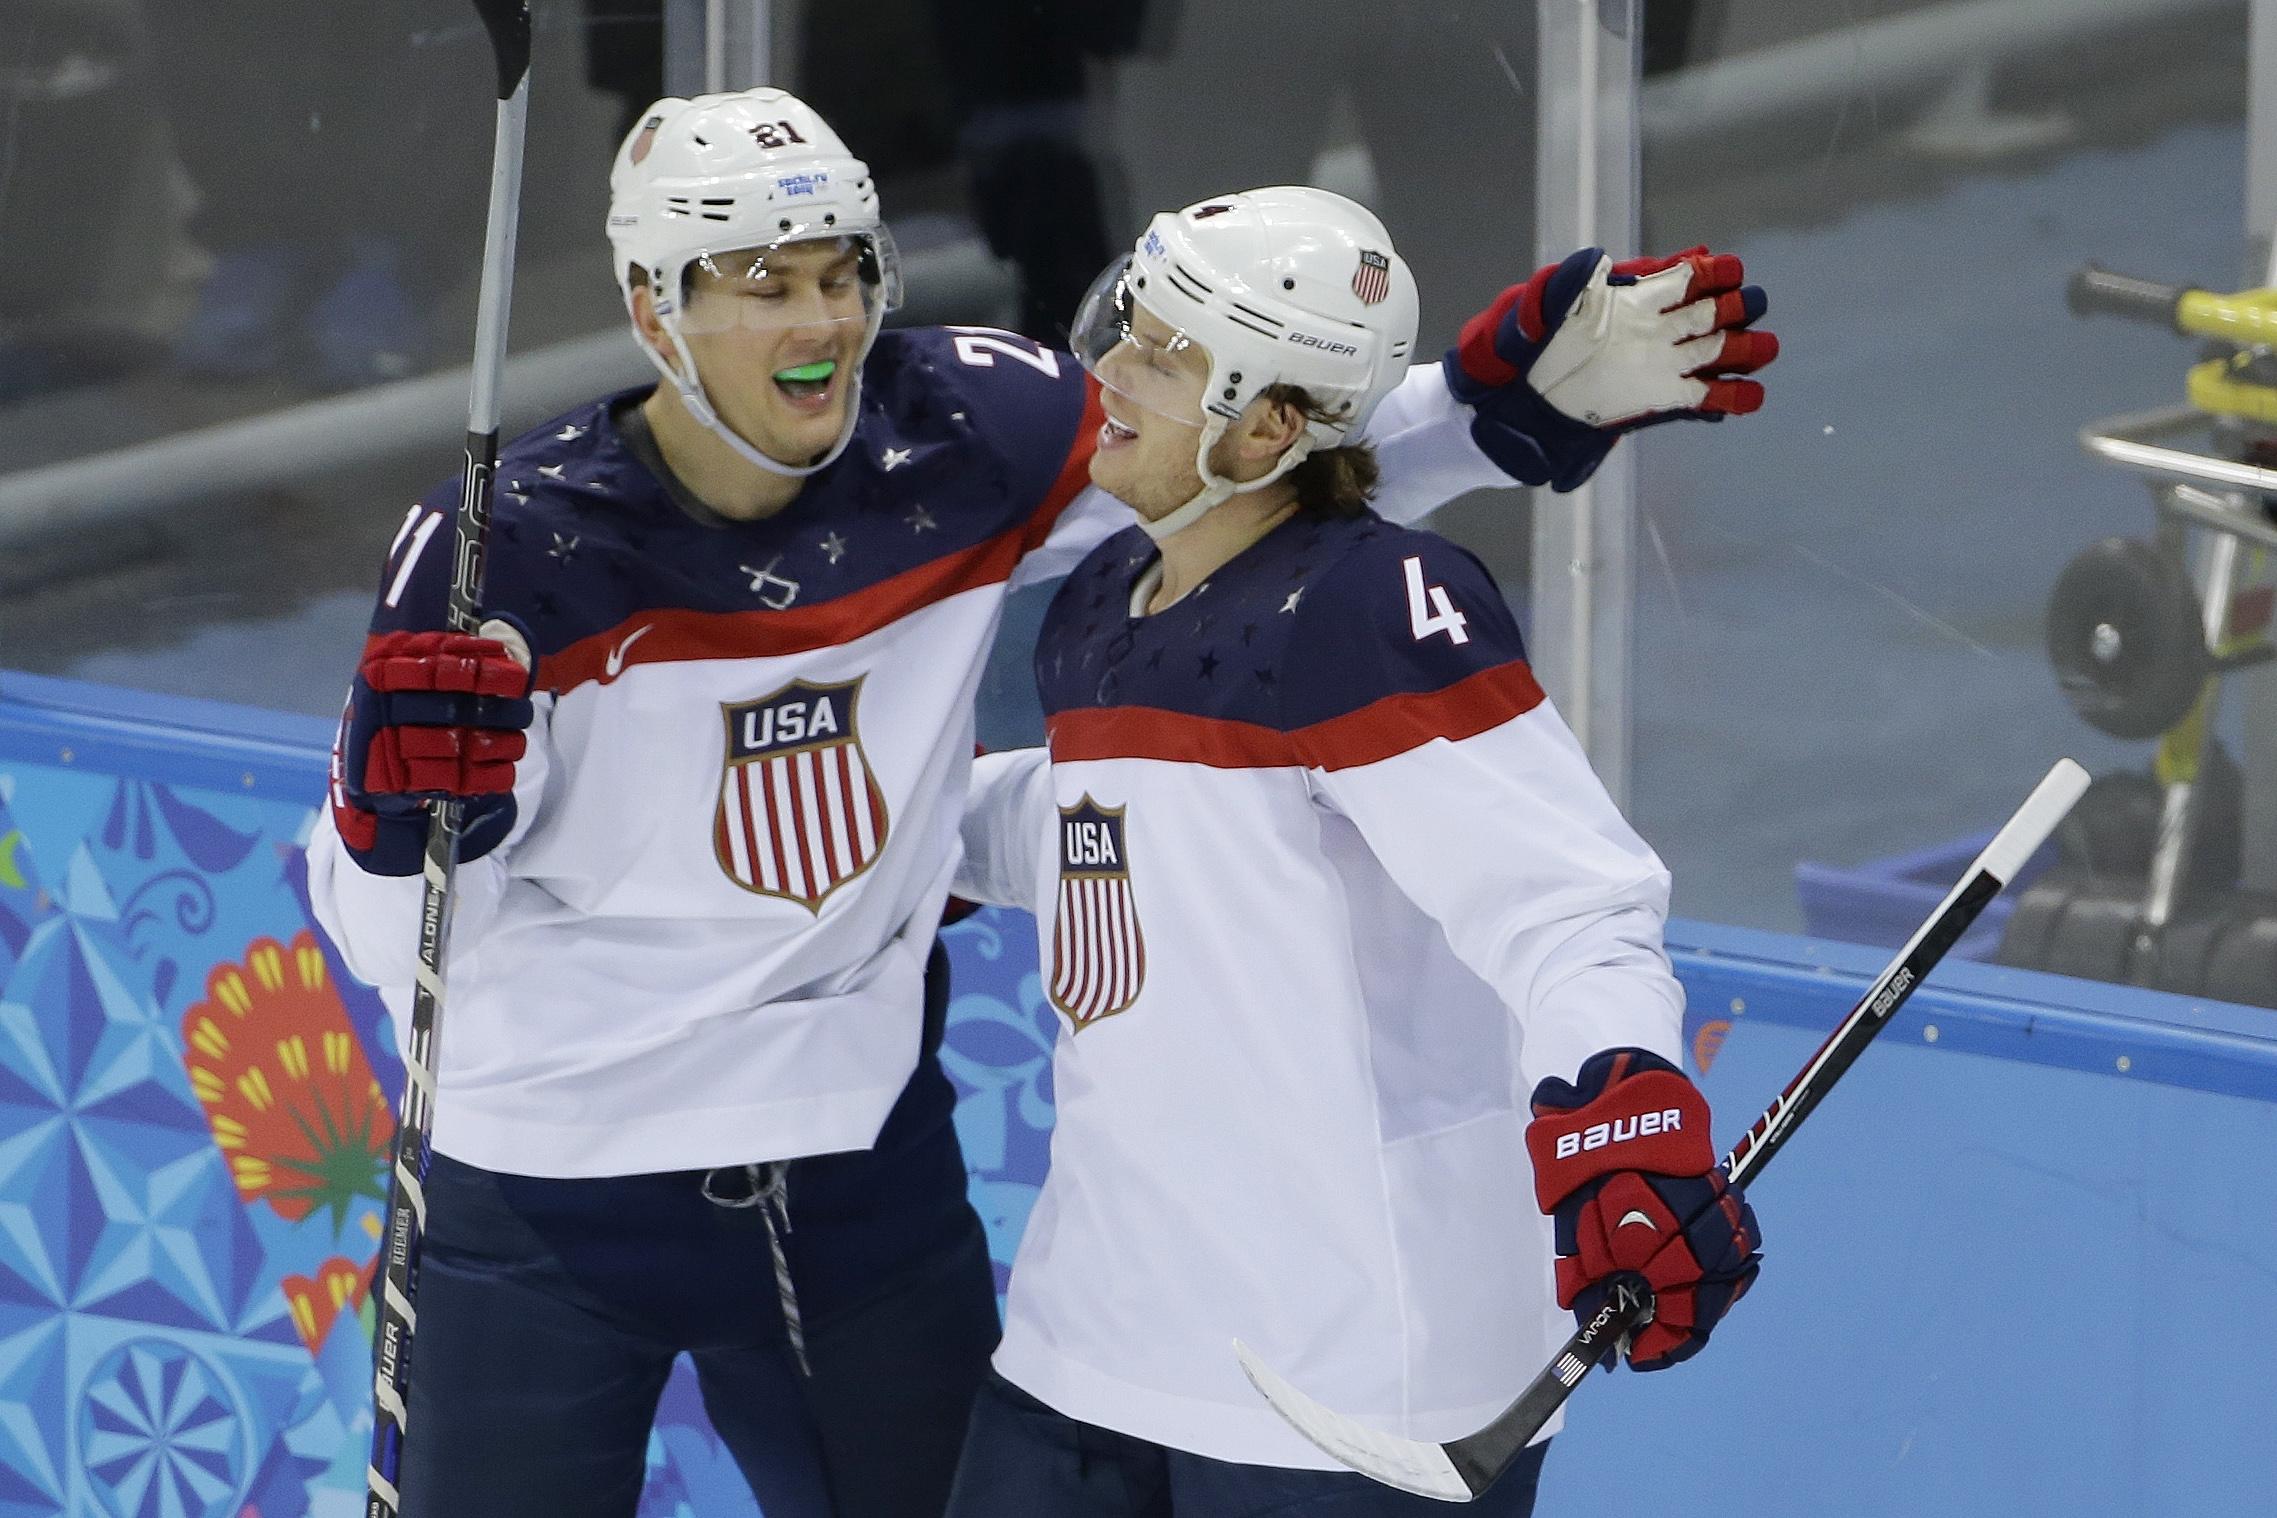 USA defenseman John Carlson, right, is congratulated for his goal against Slovakia by USA forward James van Riemsdyk during the 2014 Winter Olympics men's ice hockey game at Shayba Arena, Thursday, Feb. 13, 2014, in Sochi, Russia. (AP Photo/Matt Slocum)